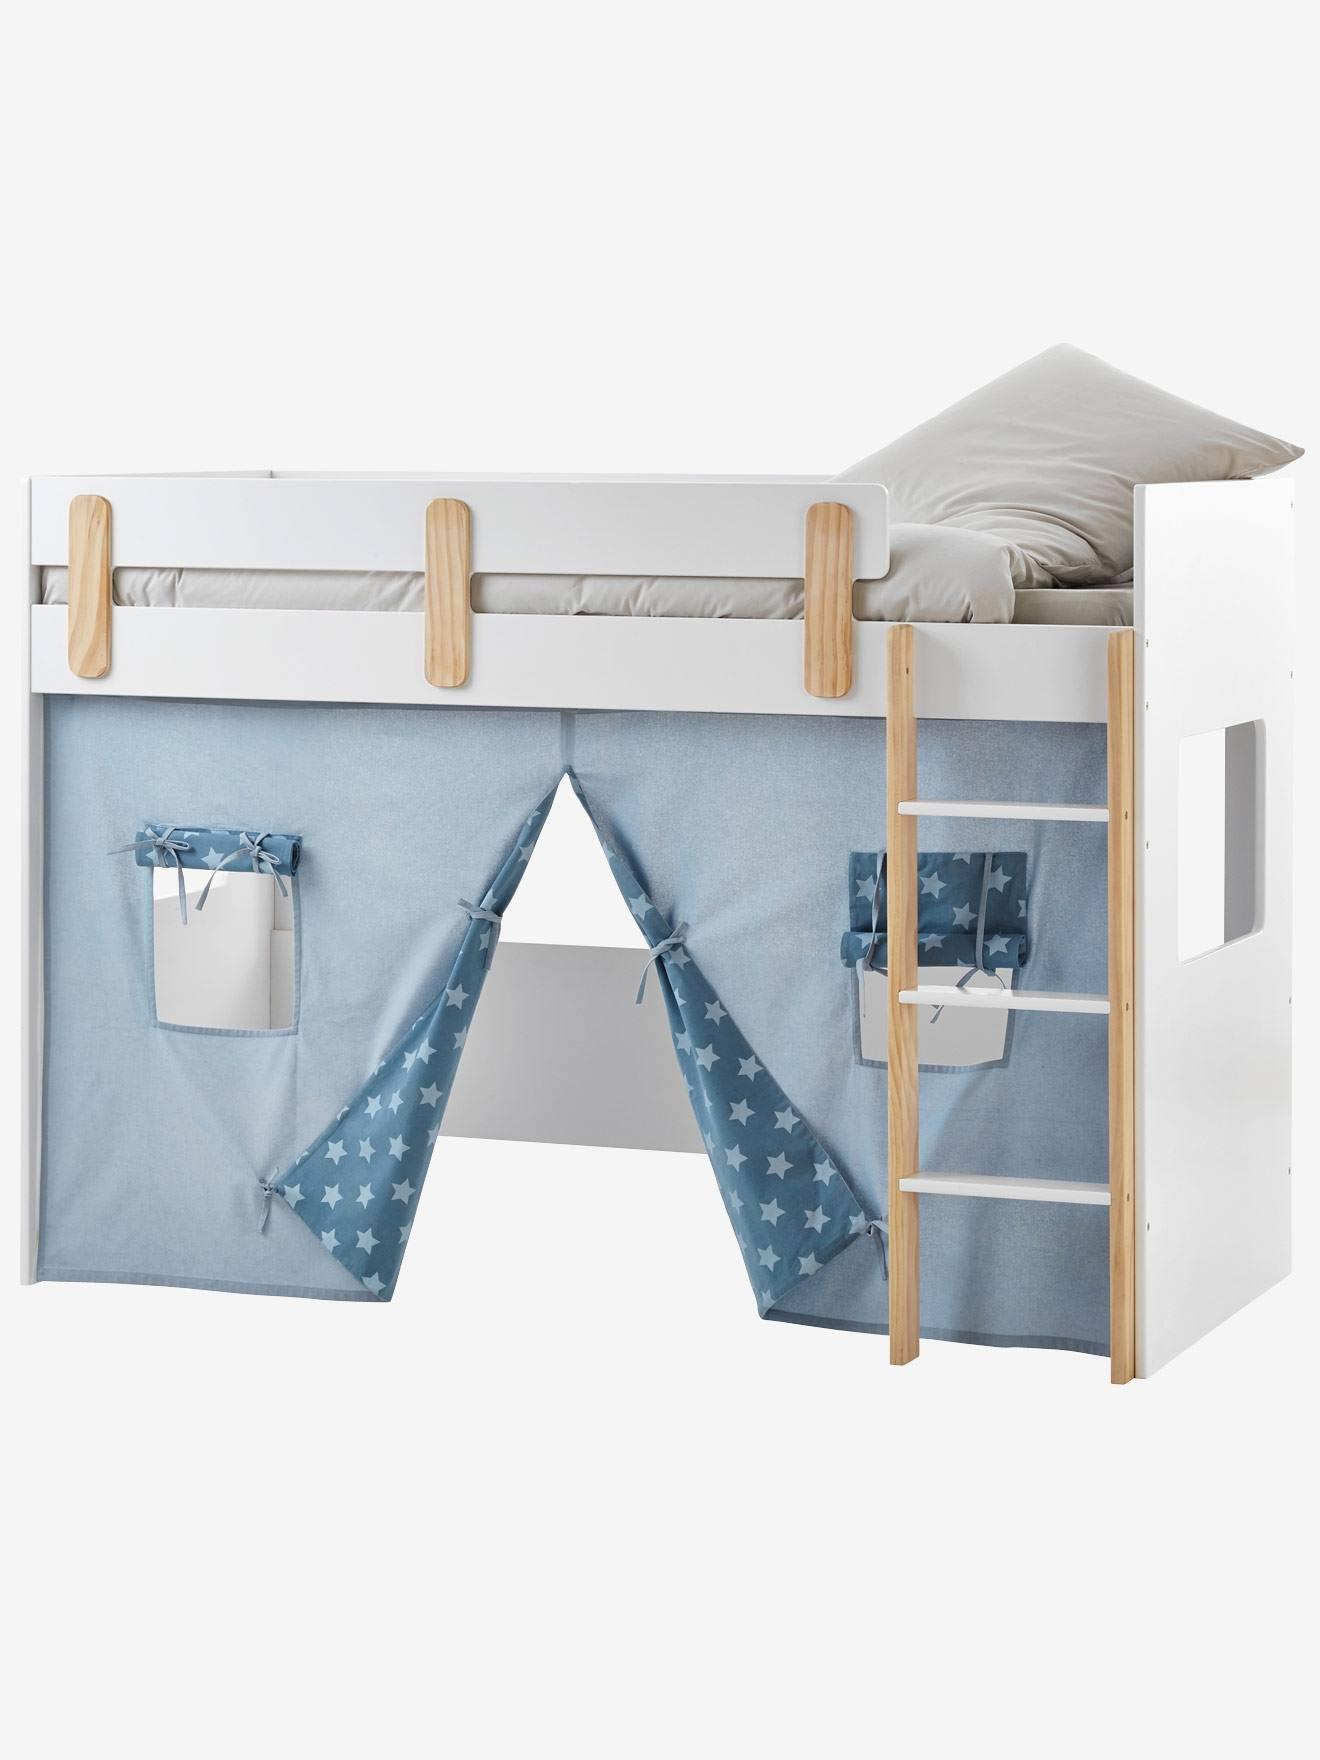 Bettvorhang Für Kinder Hochbett   Blau/bedruckt+rosa/bedruckt   1